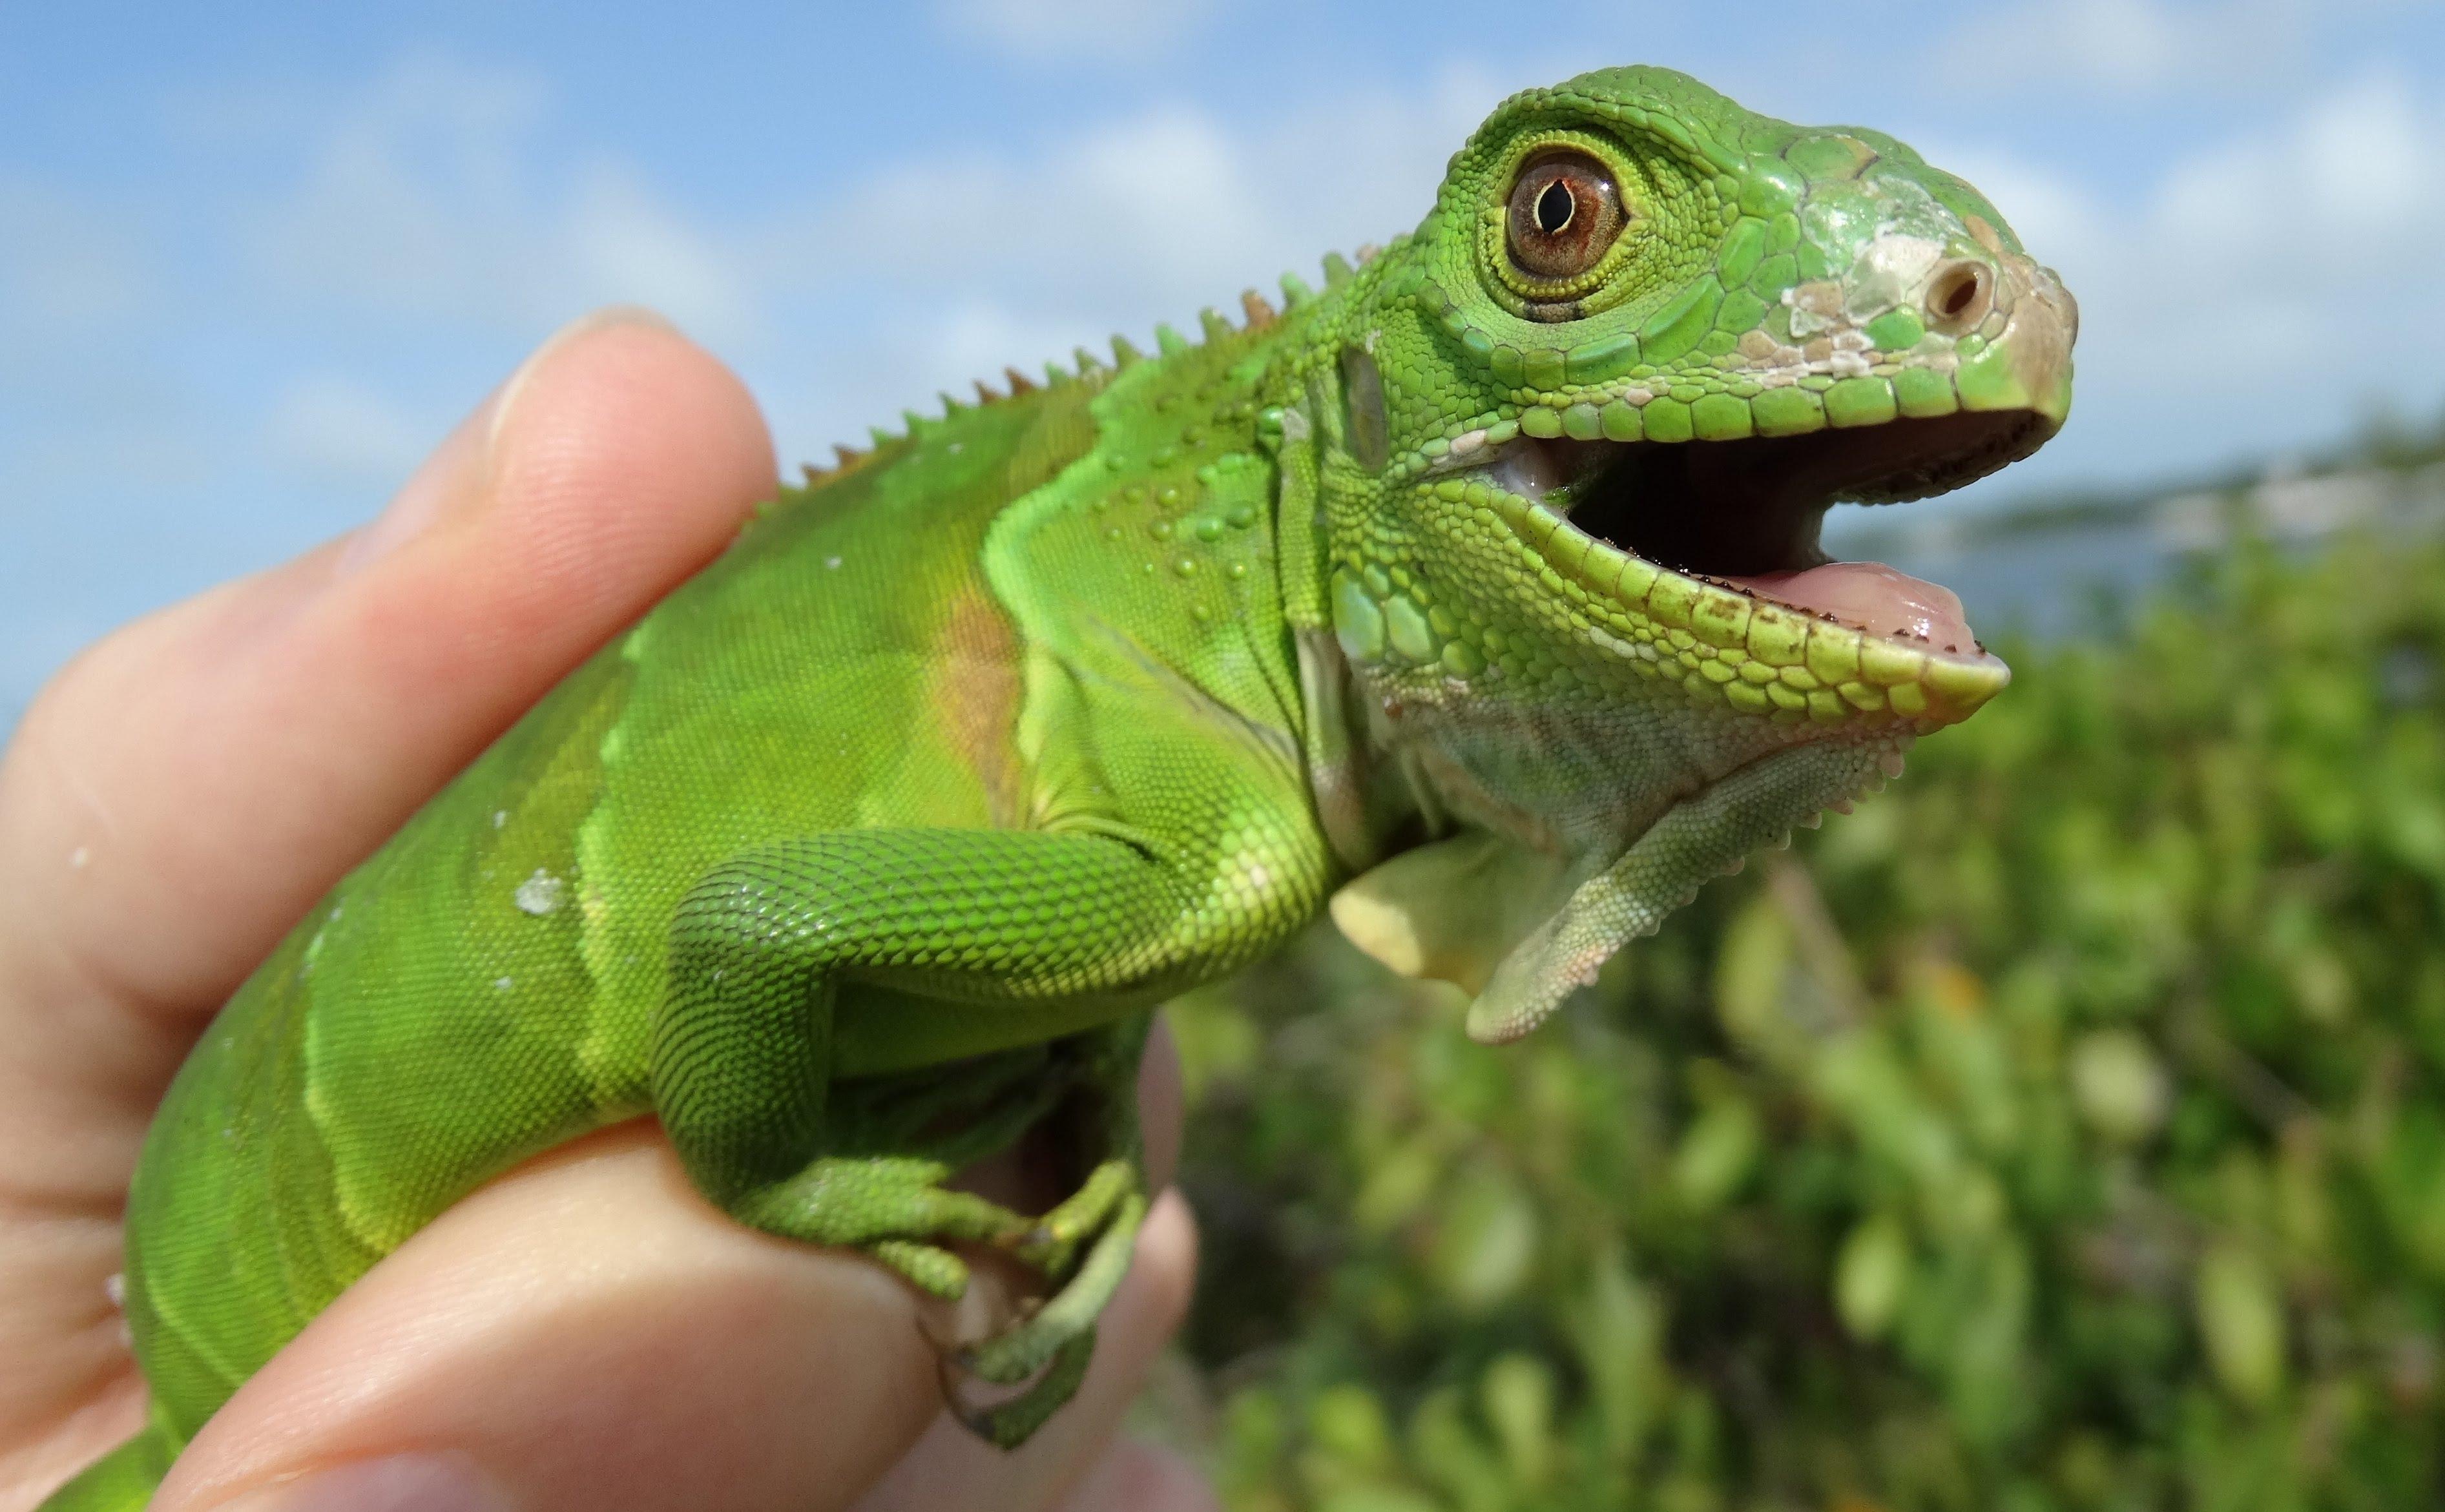 Wild iguana photo